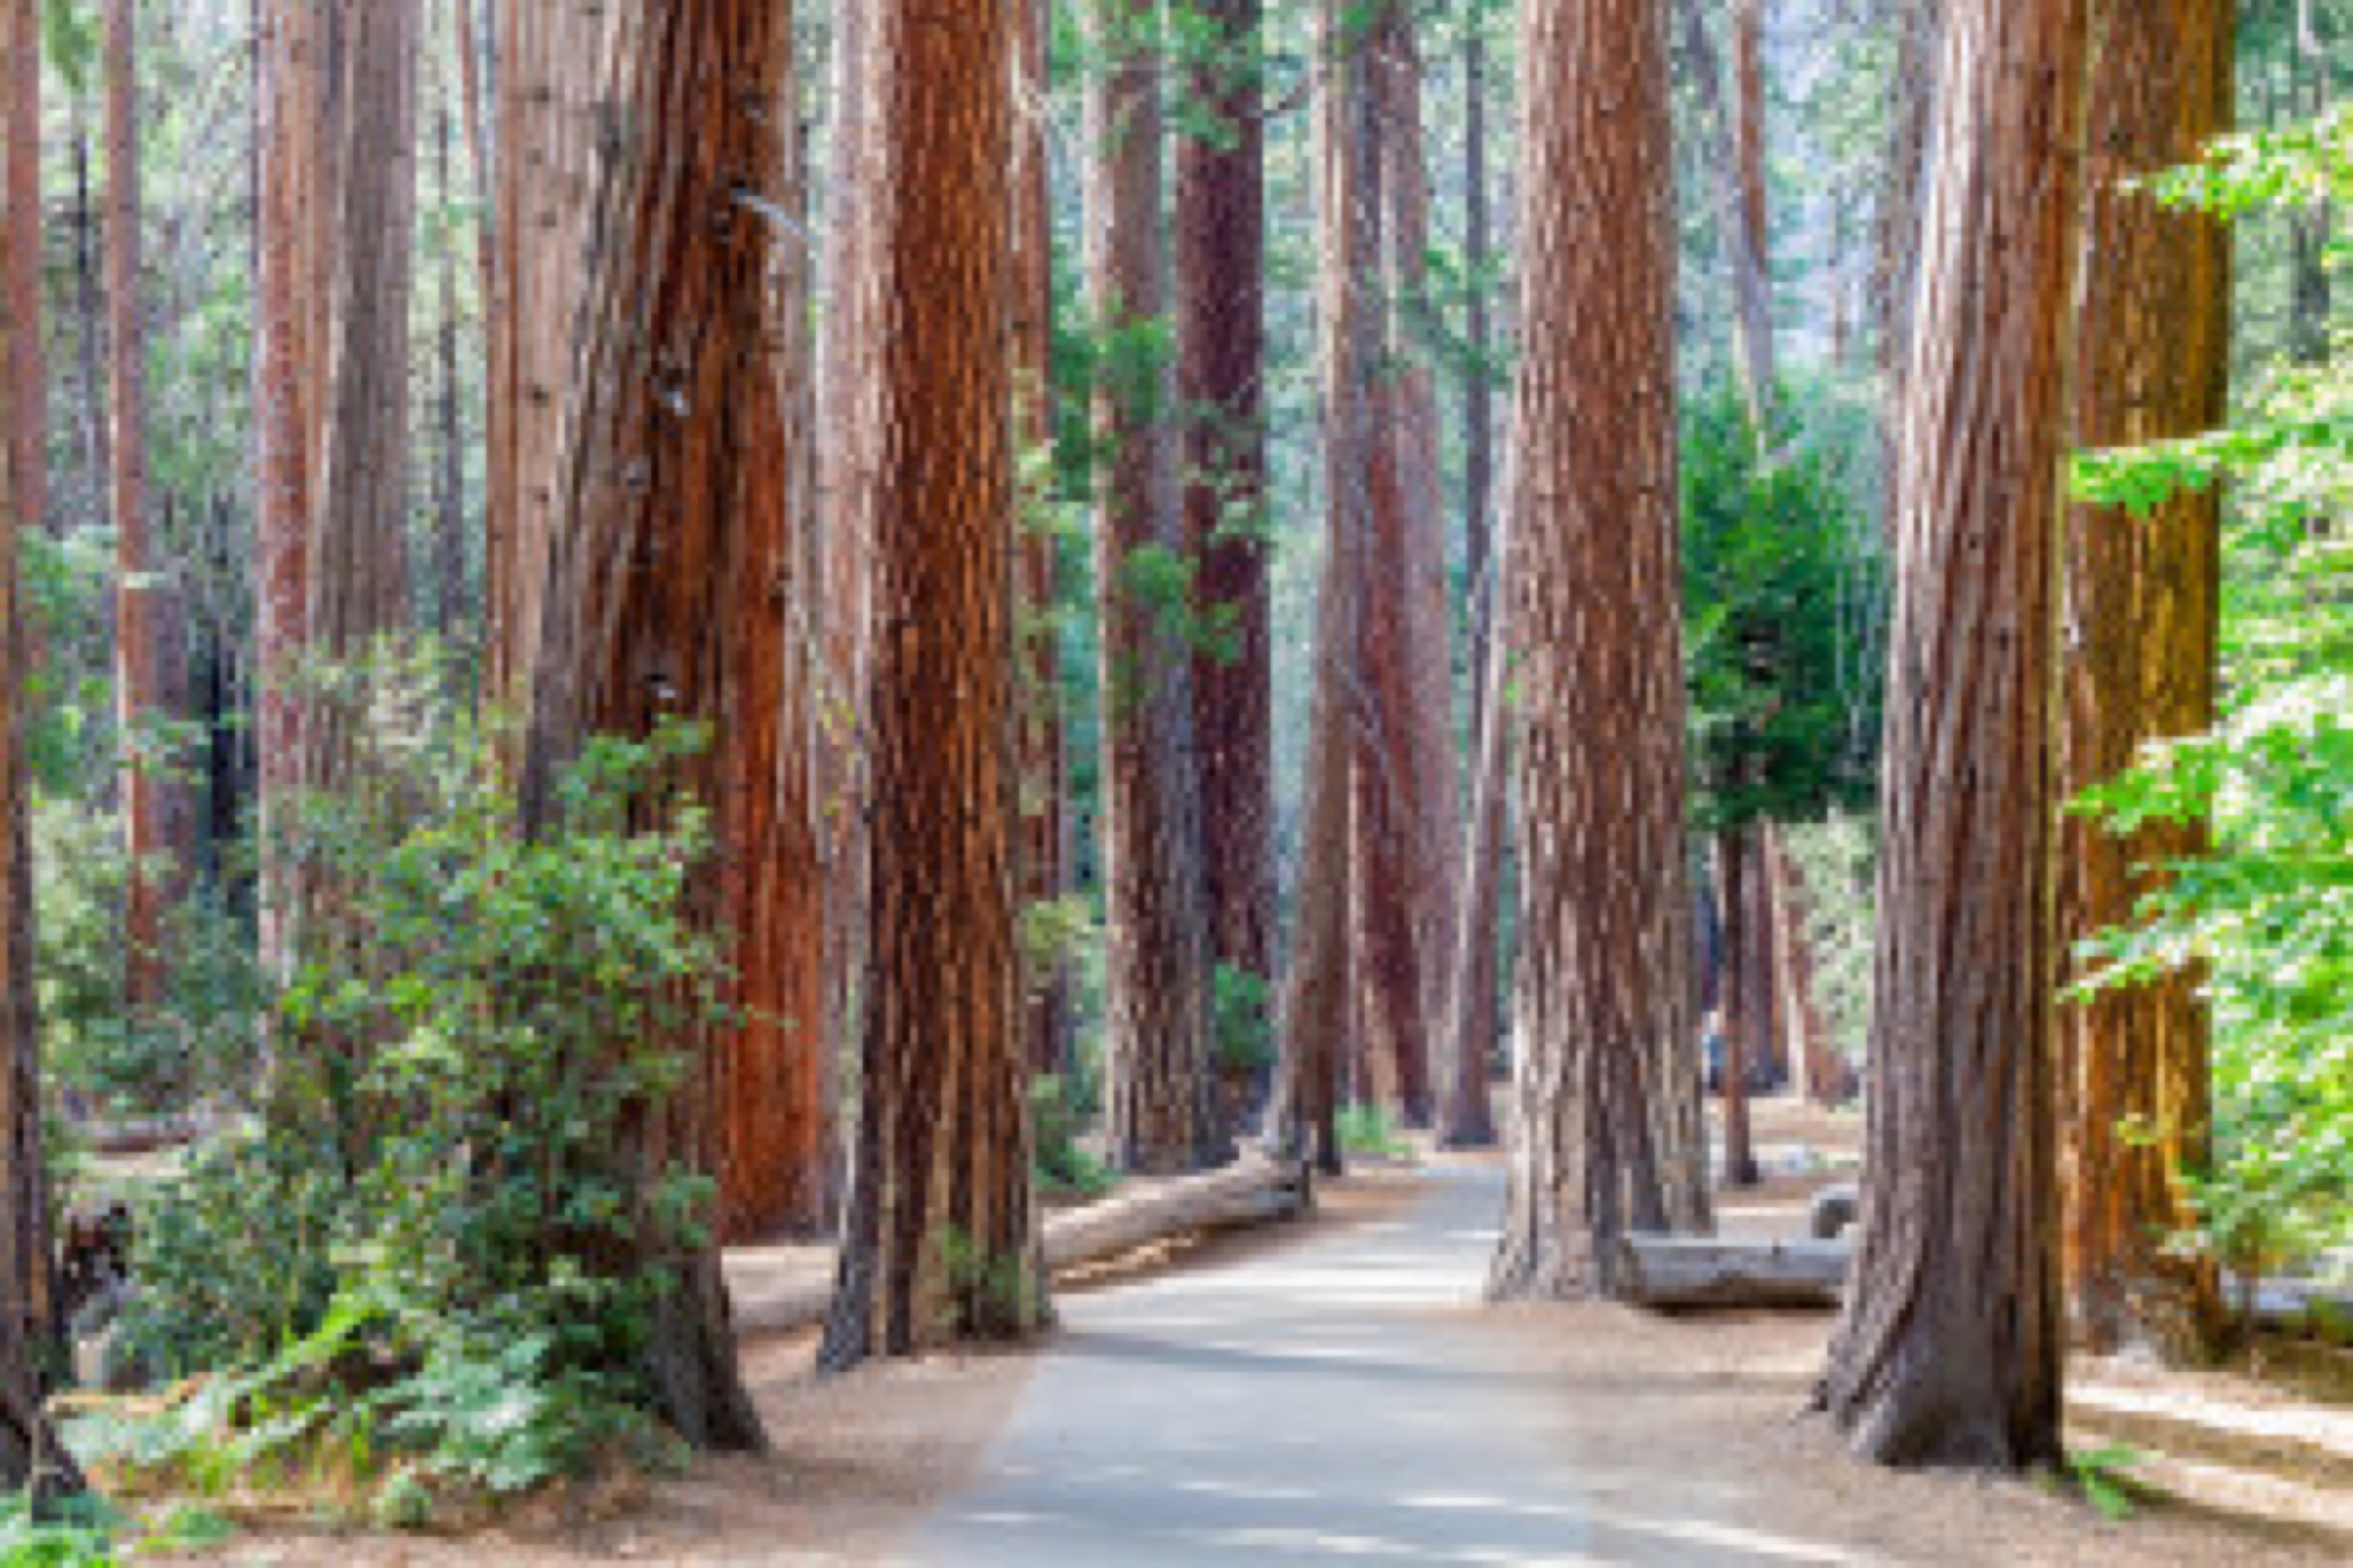 Yosemite National Park trees. California, USA